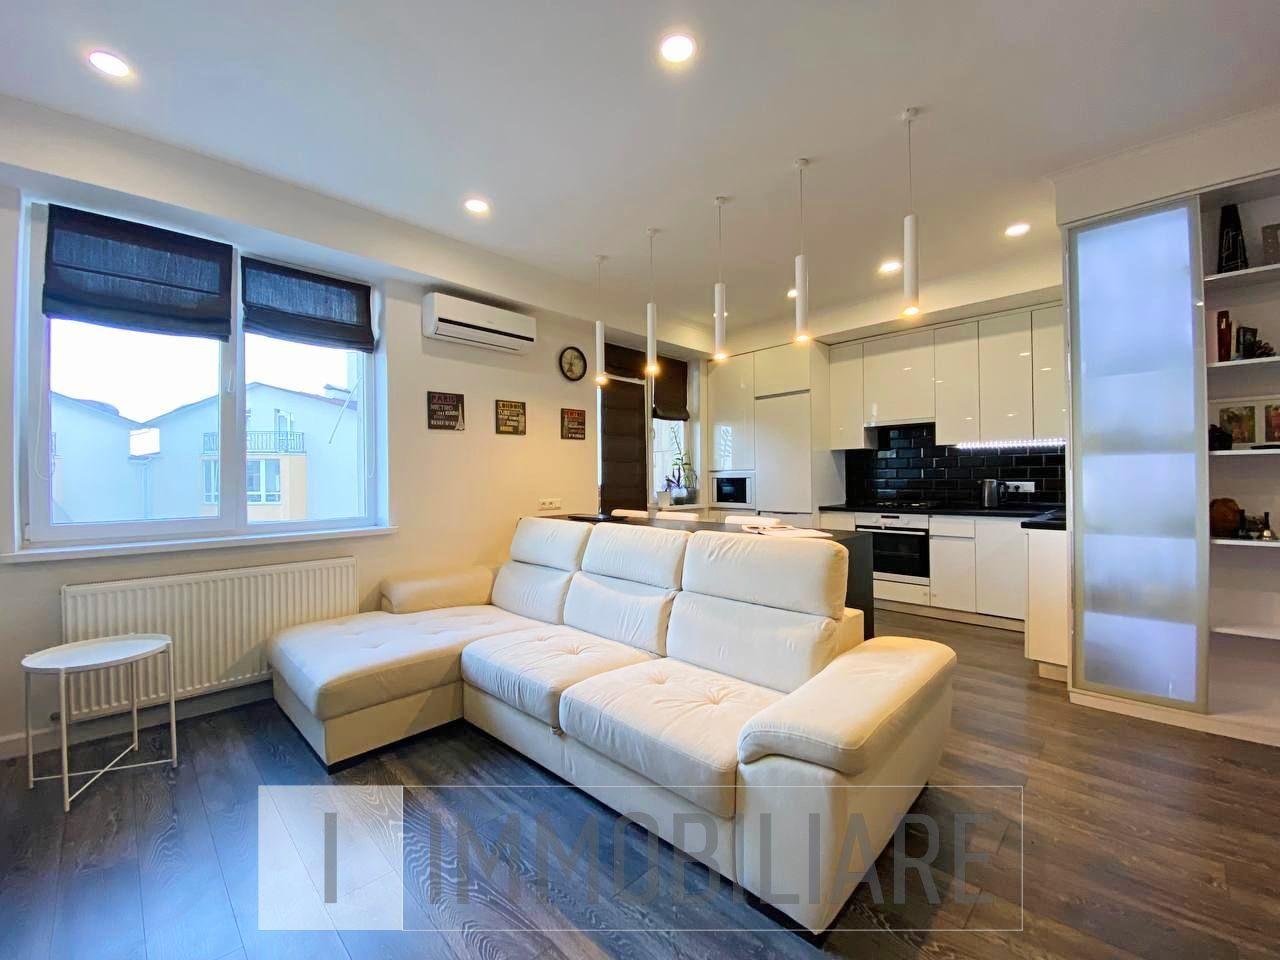 Apartament cu 2 camere+living, sect. Centru, str. Nicolae Testemițanu.